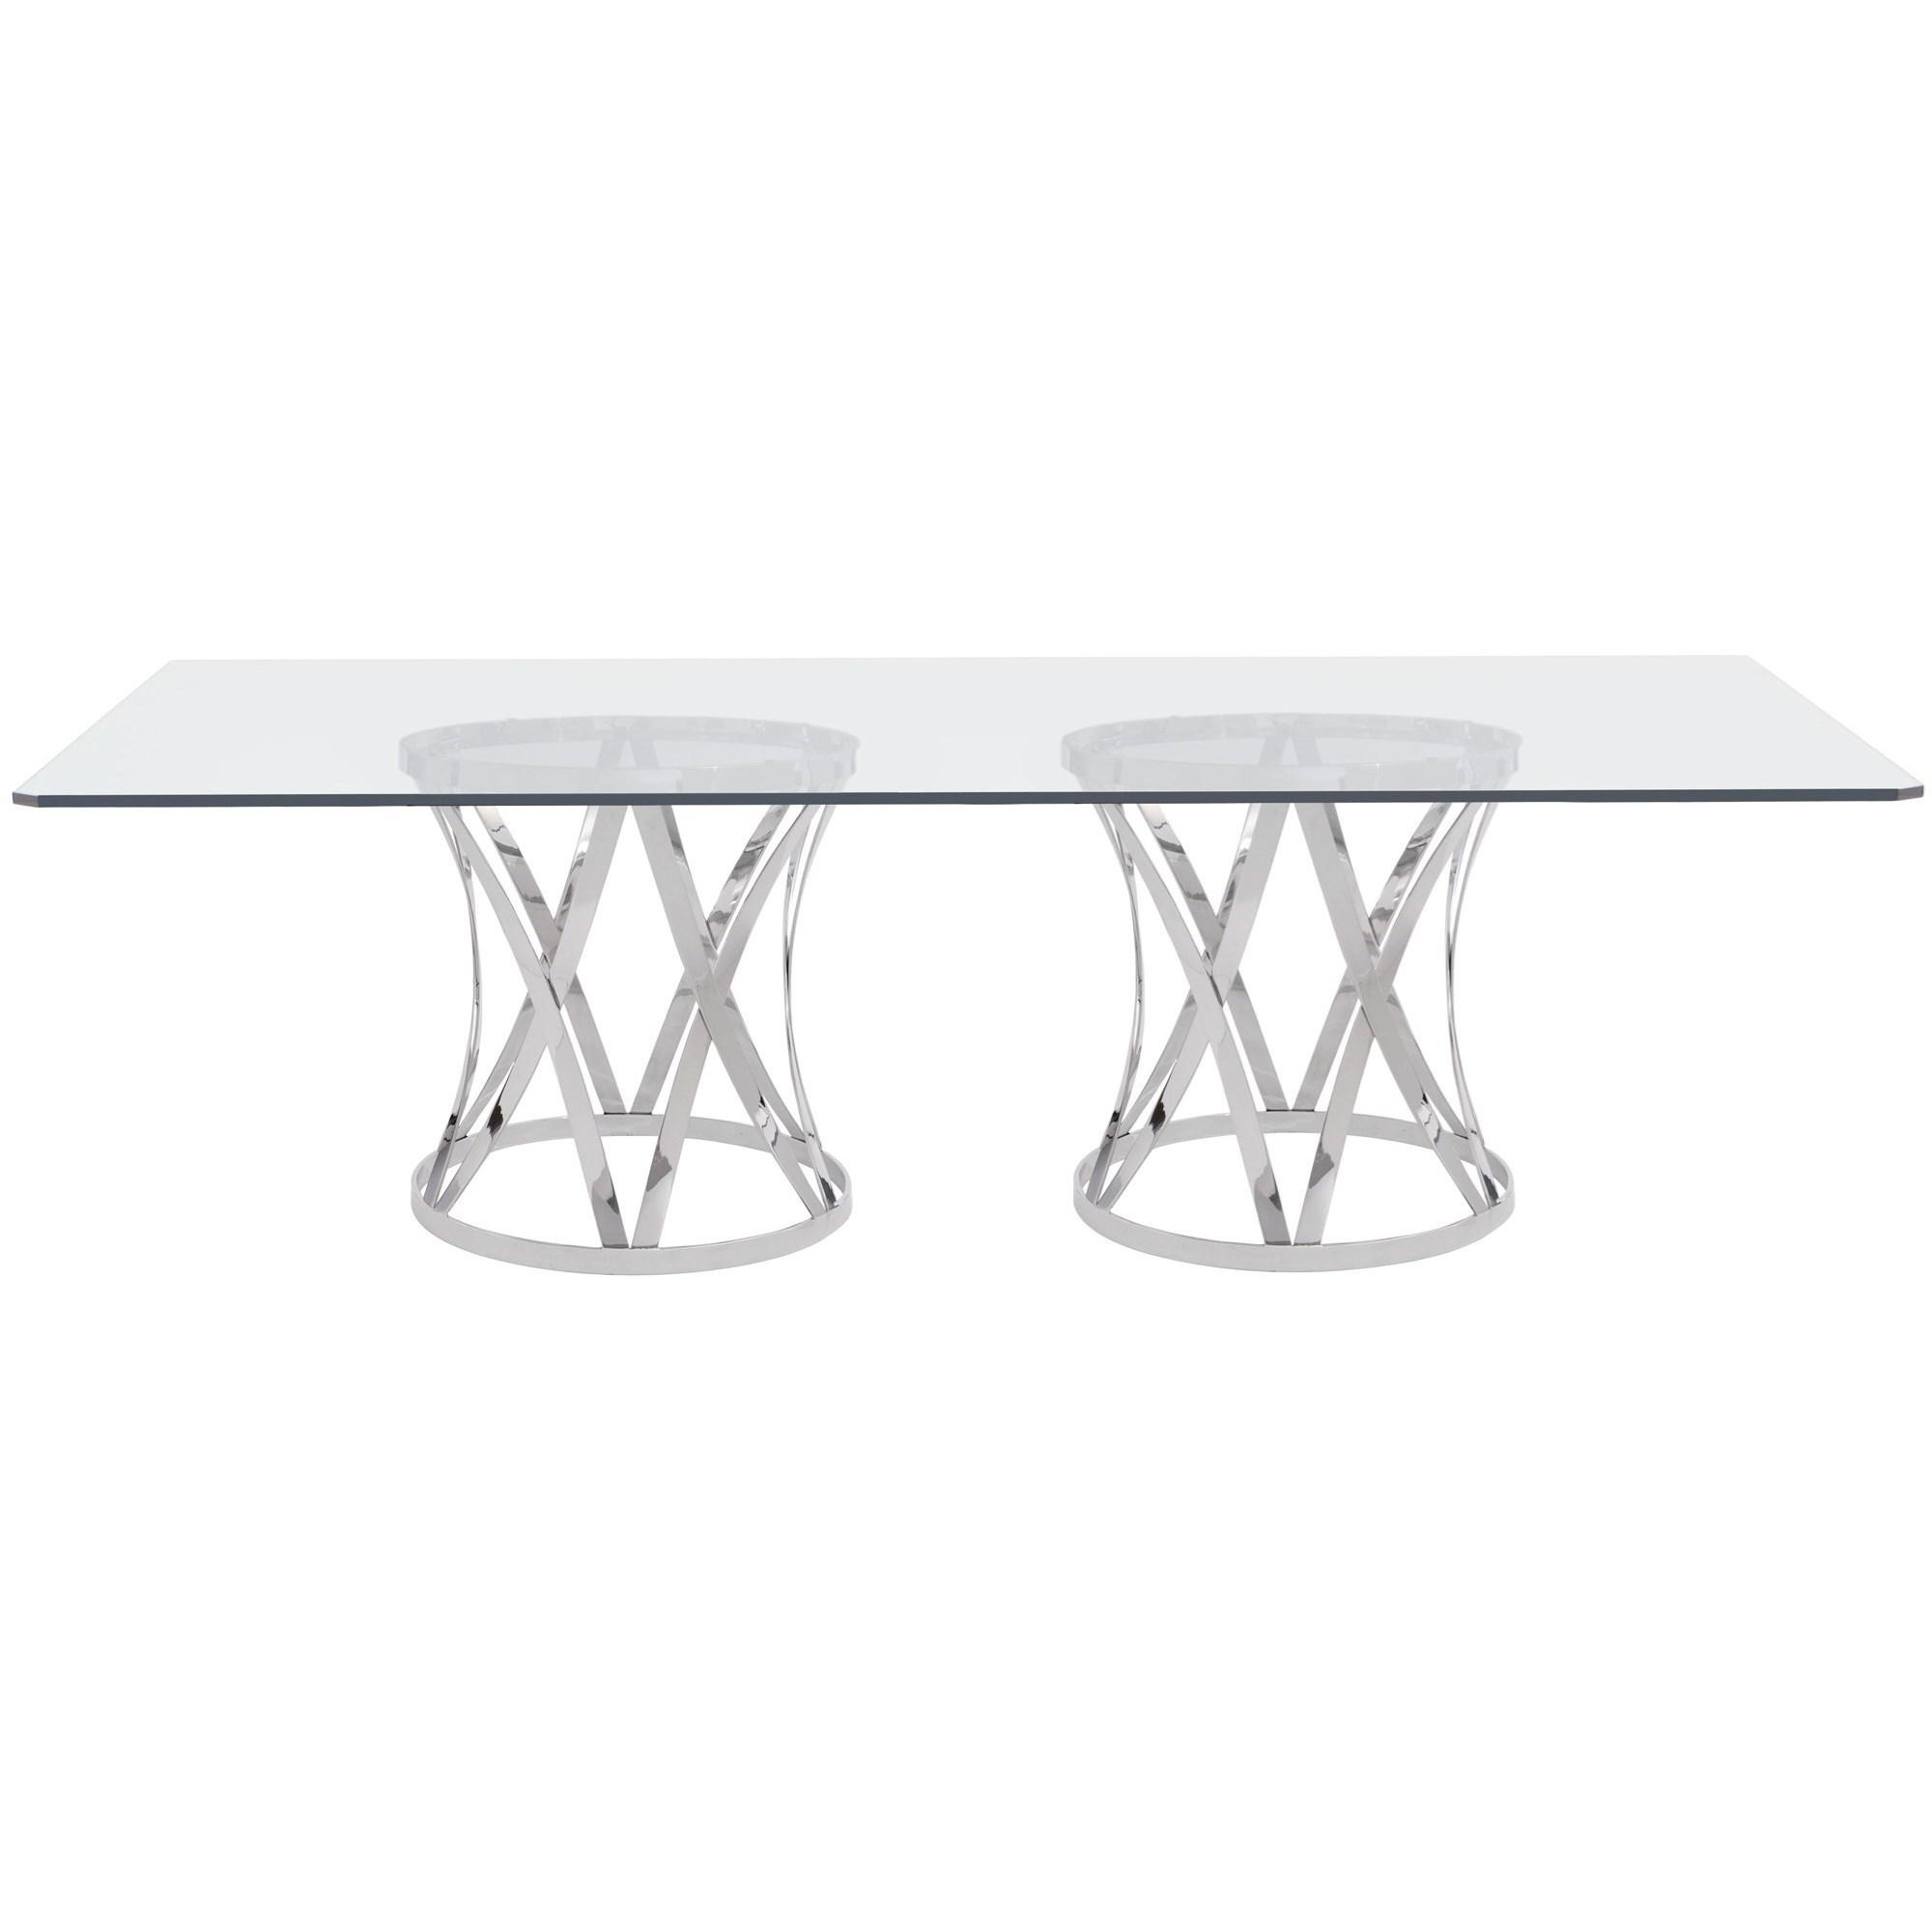 Interiors - Gustav Rectangular Dining Table at Williams & Kay